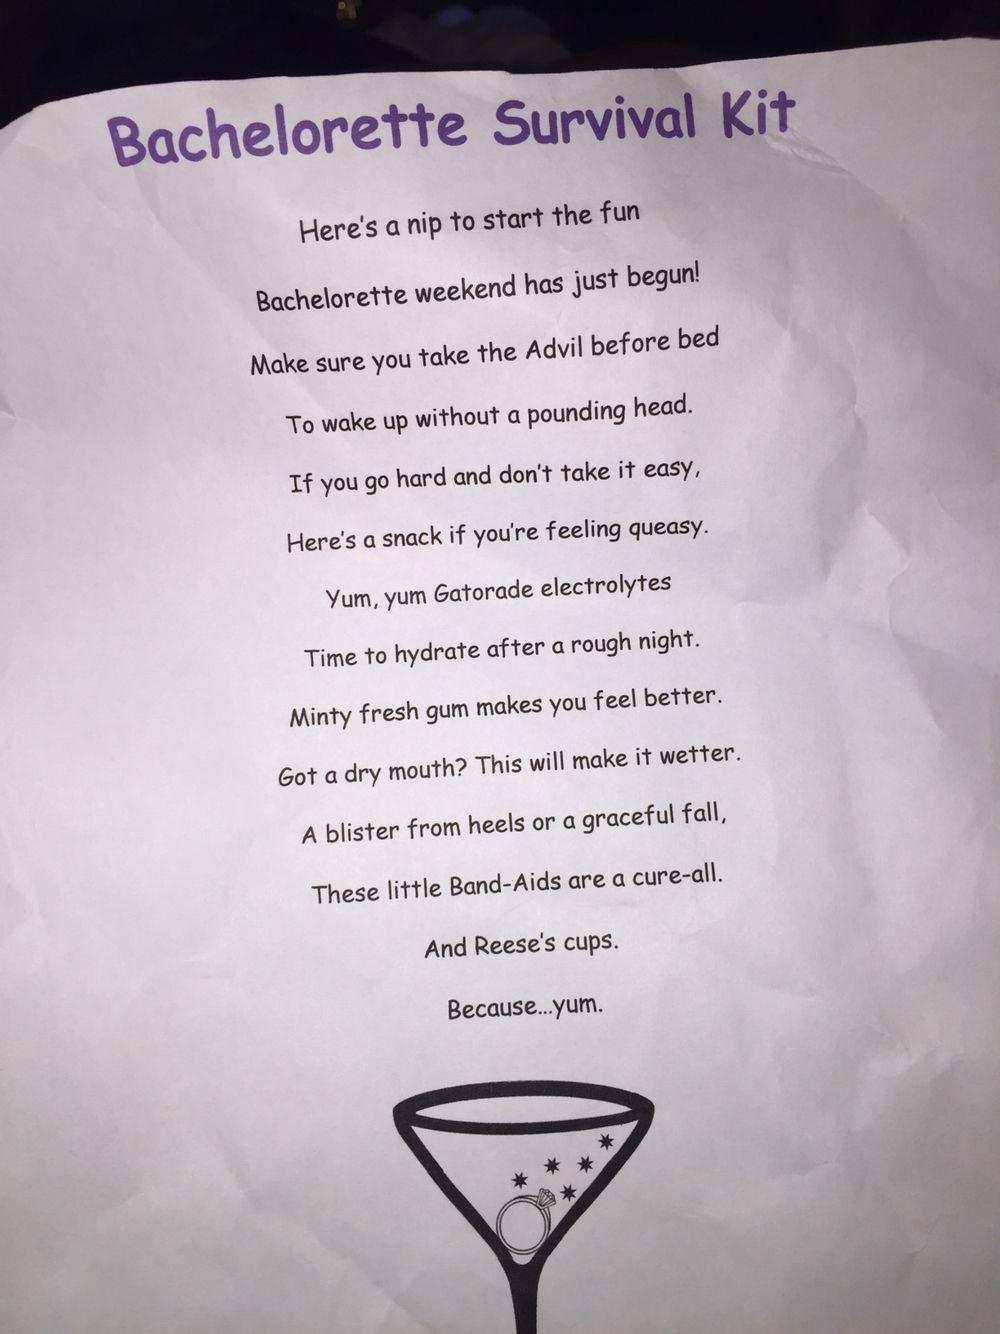 Bachelorette survival kit poem | Love in 2019 ...